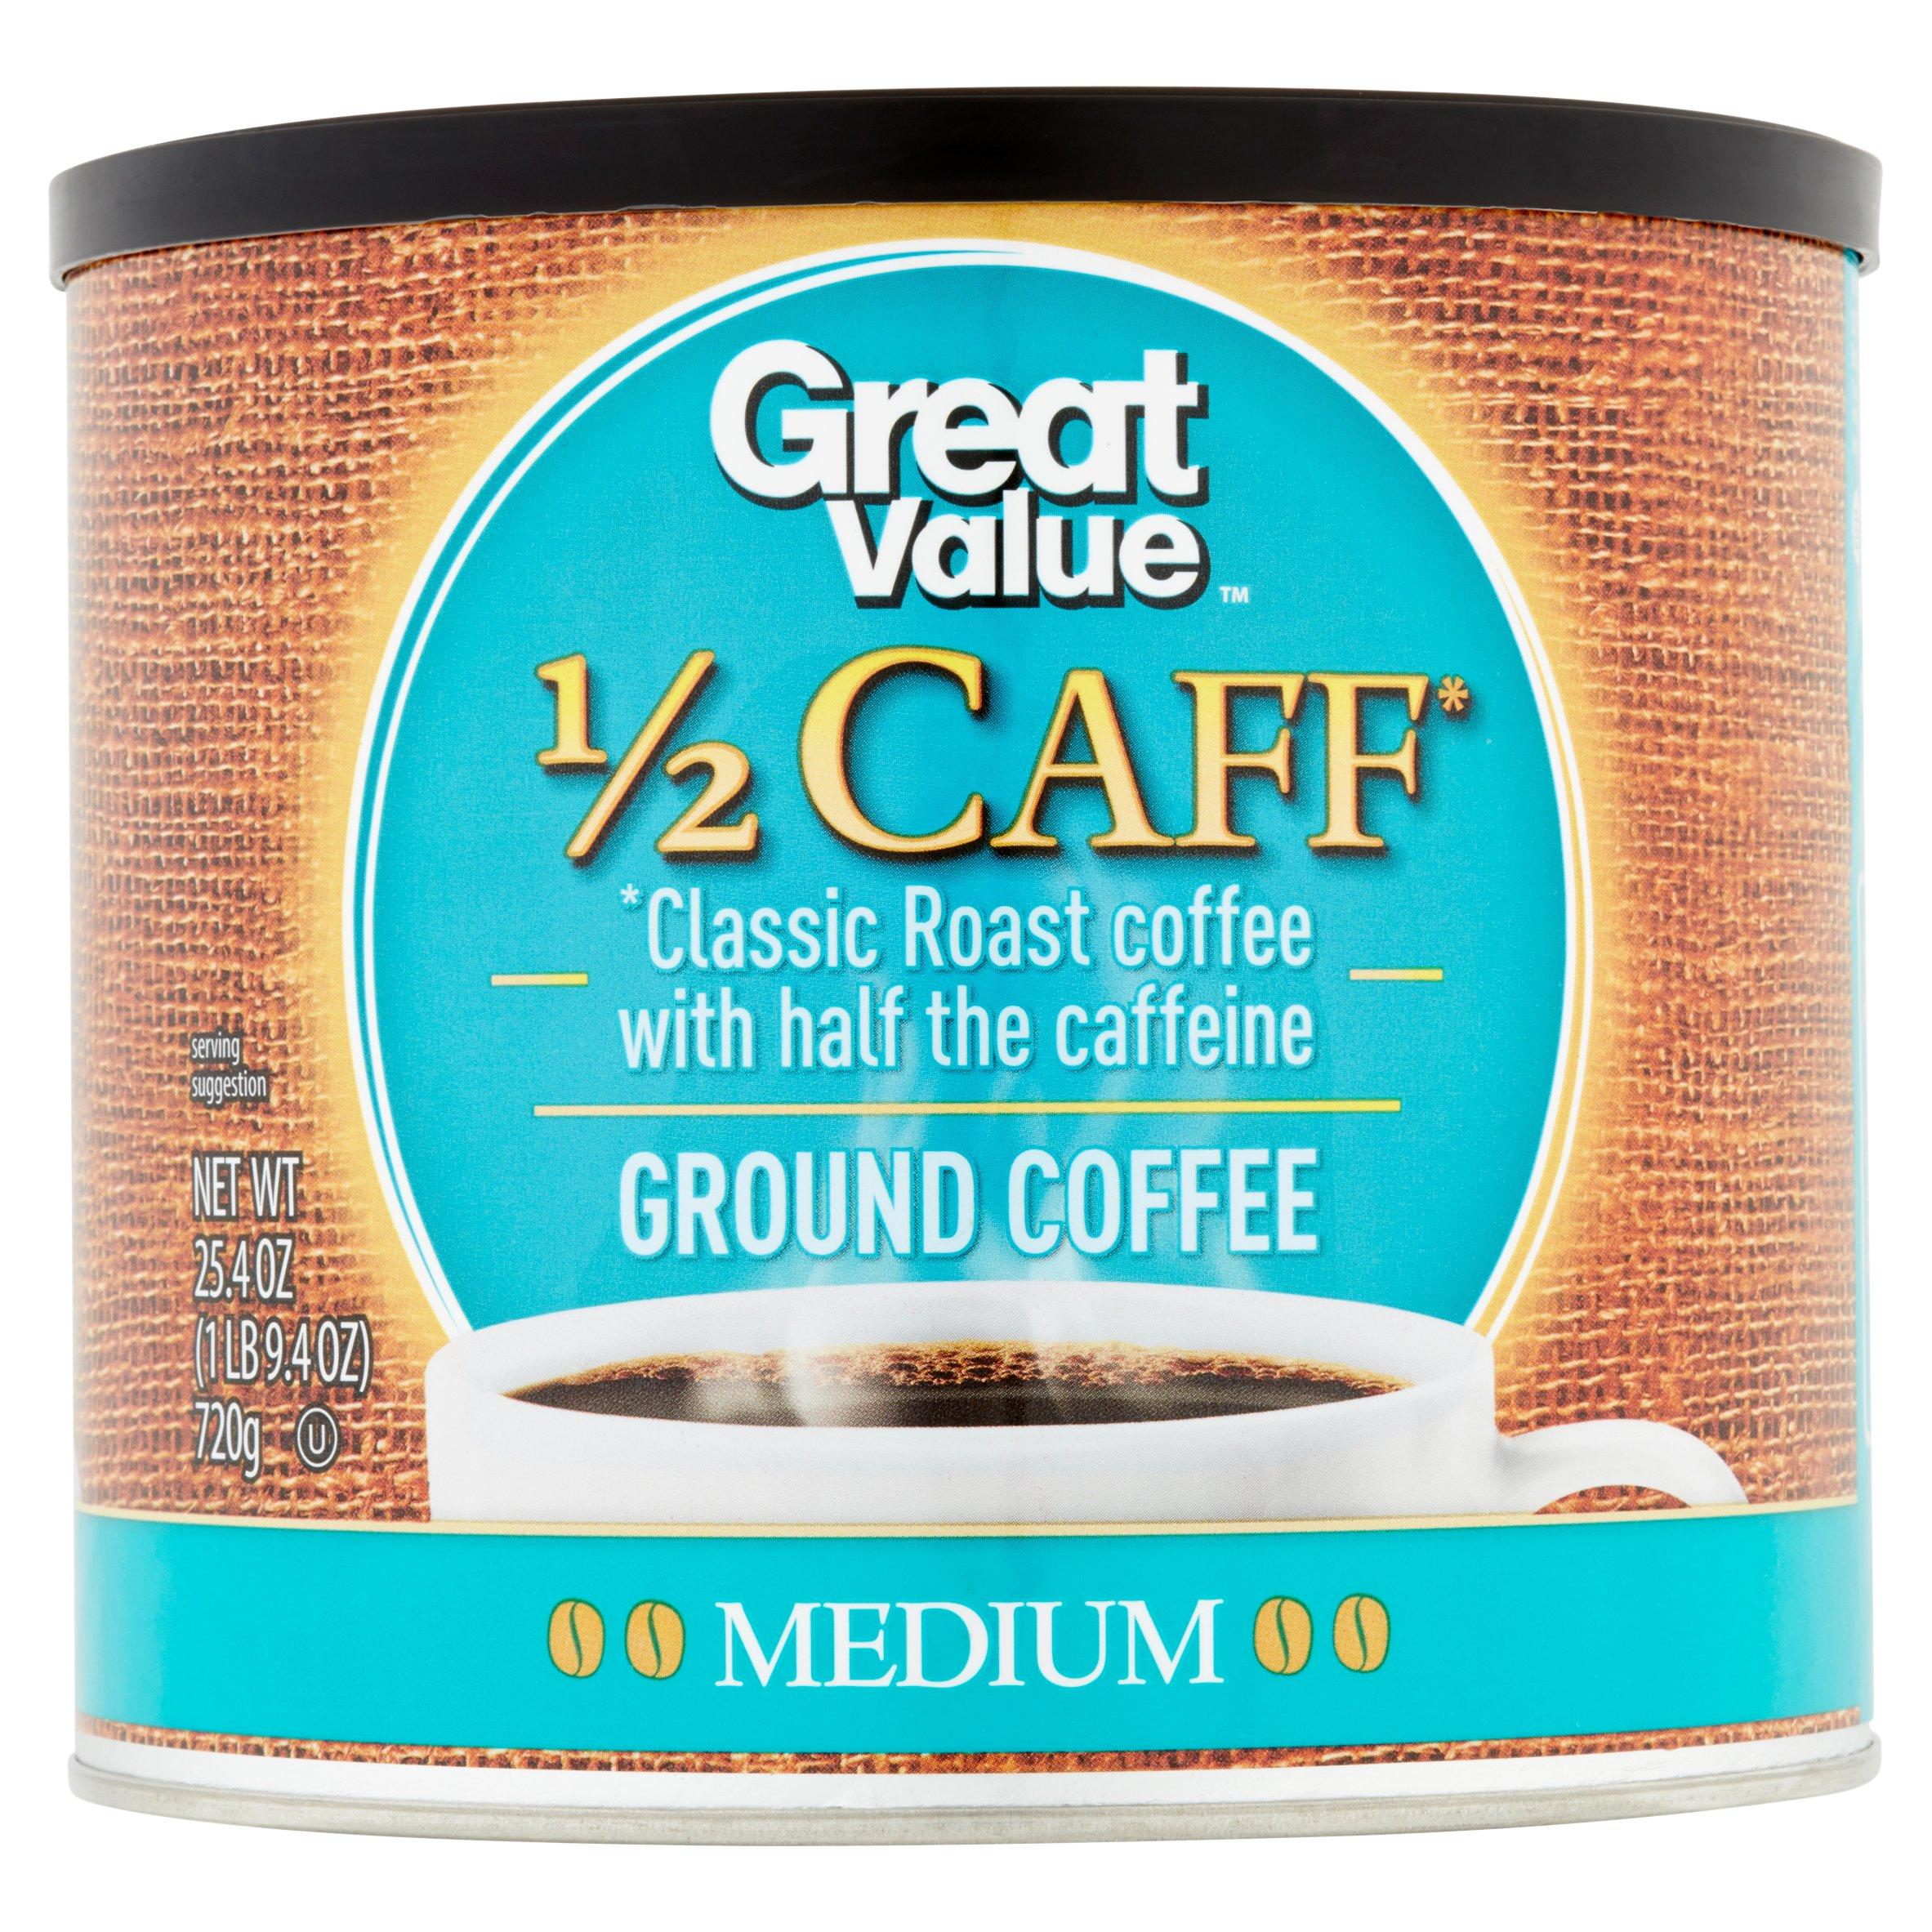 Great Value 1/2 Caff Ground Coffee, Medium Roast, 25.4 oz